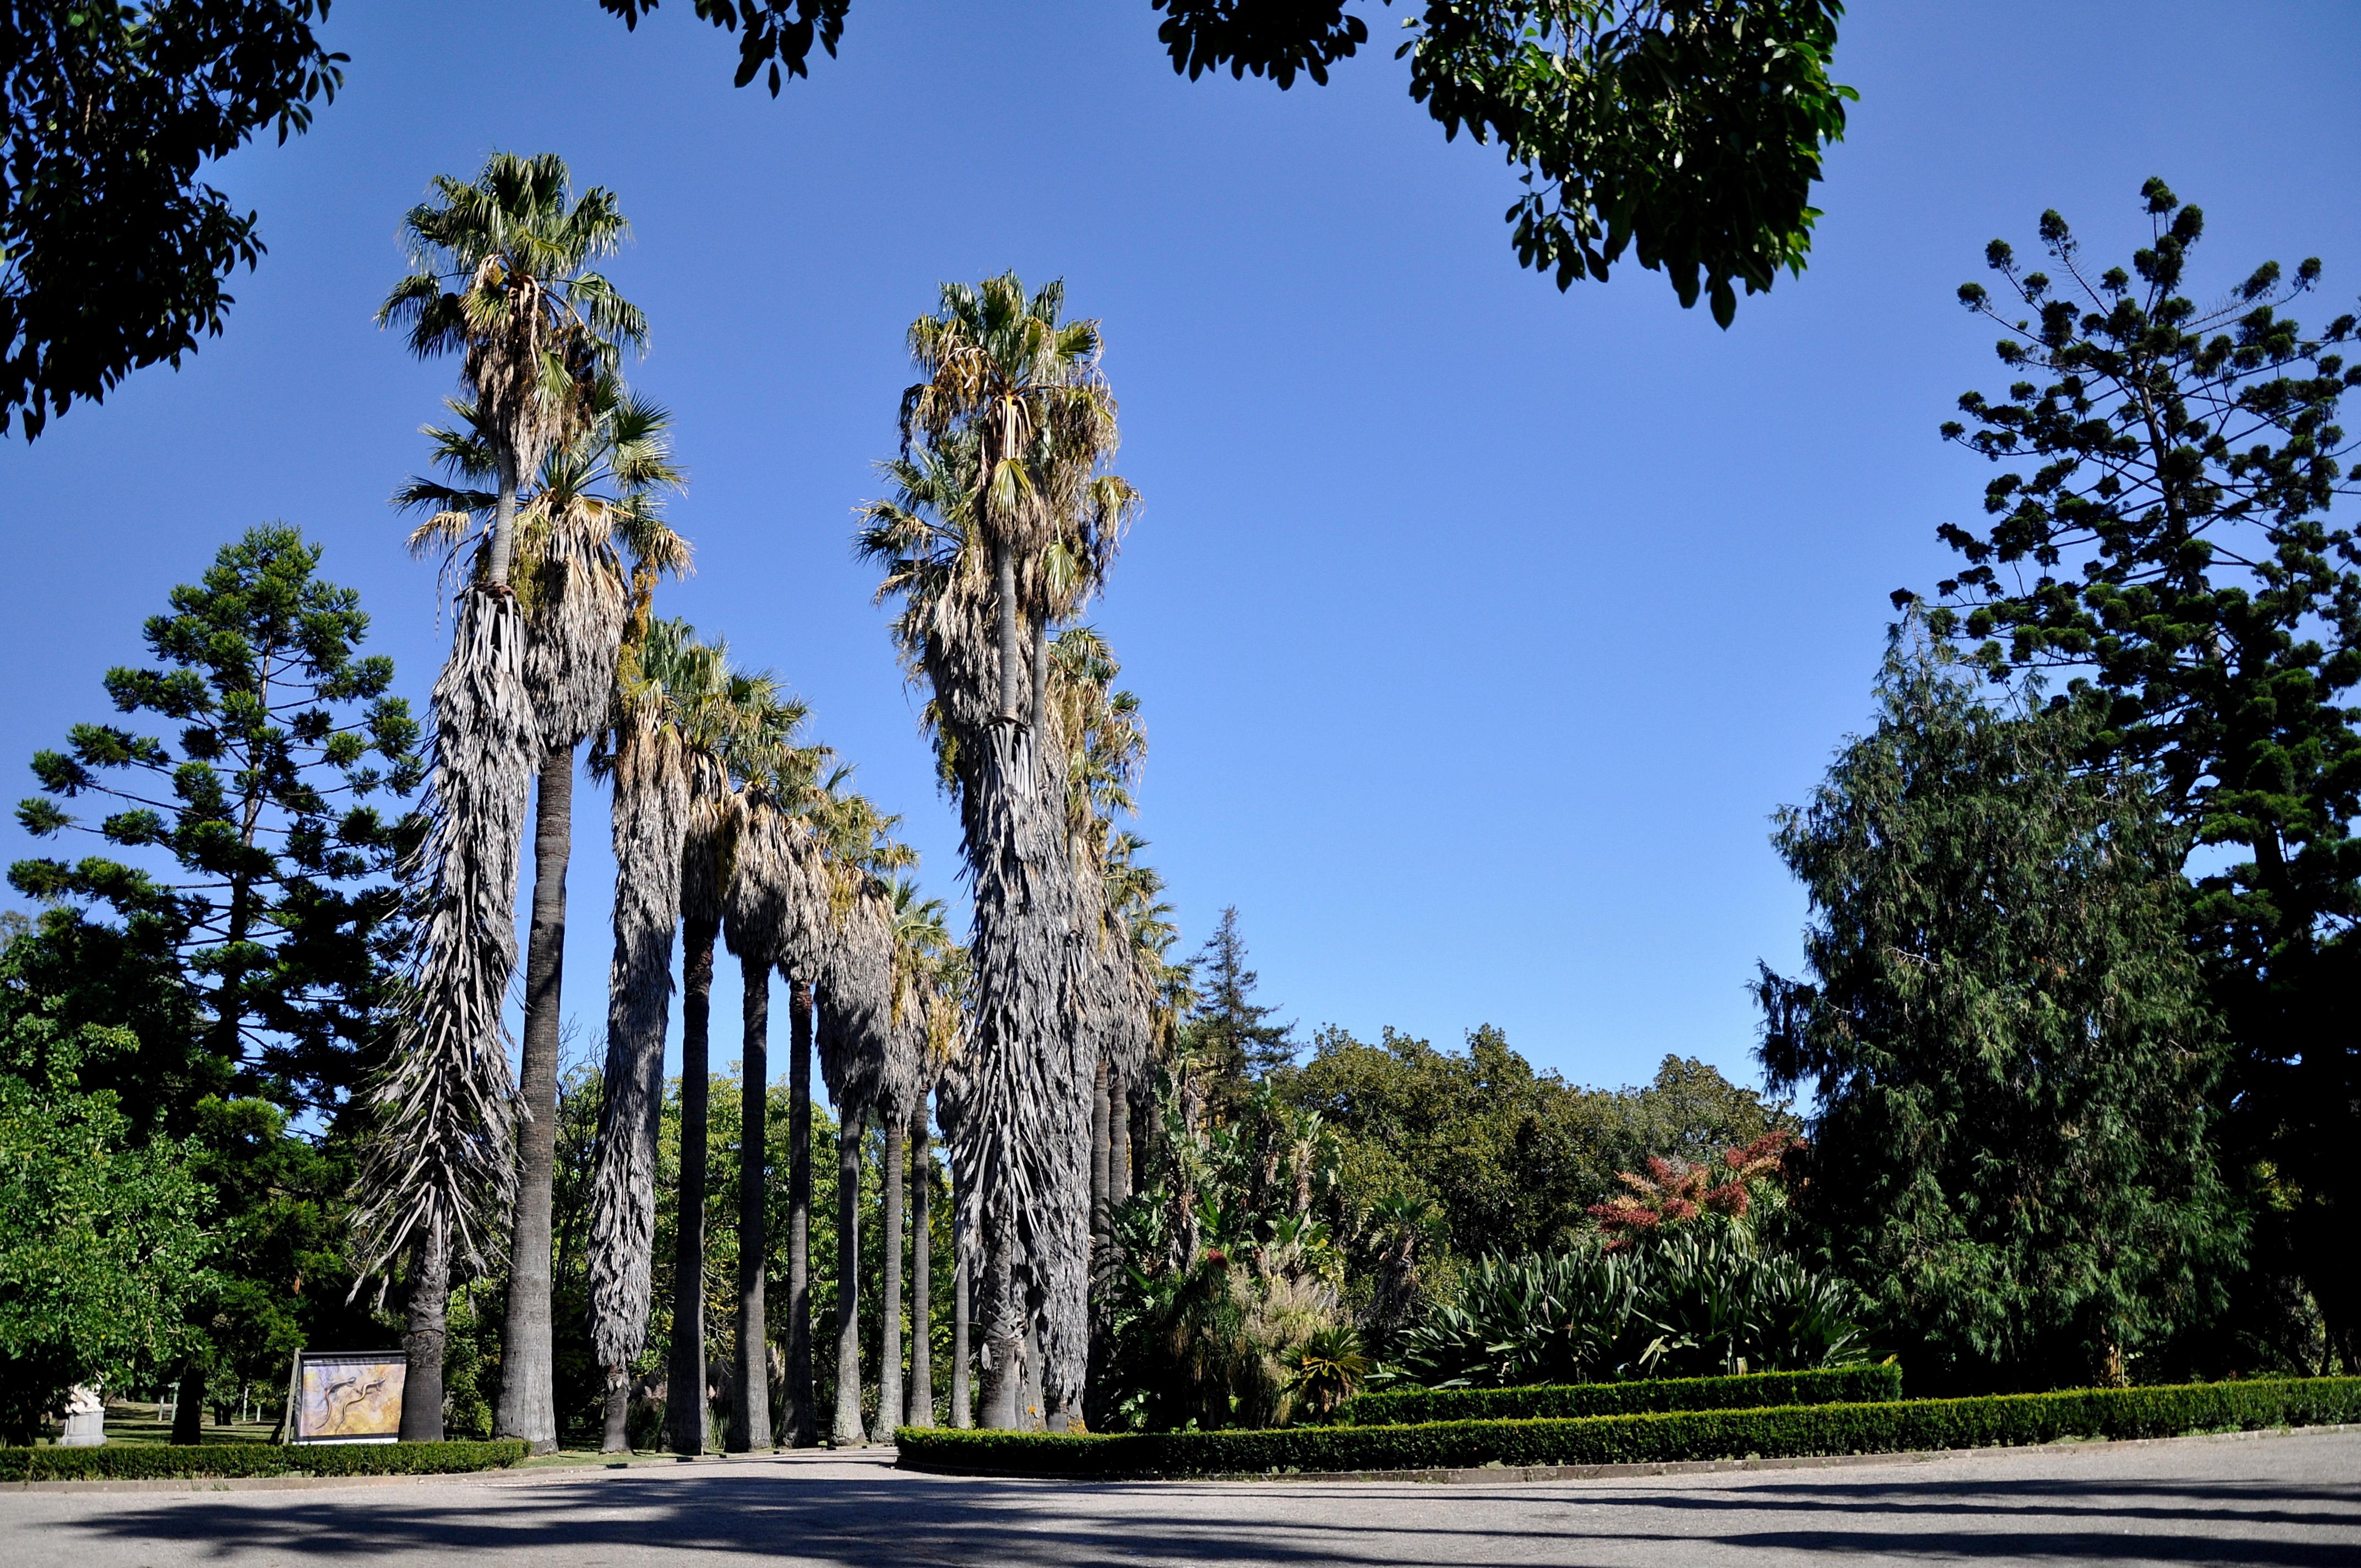 FileLisboa Jardim Botânico Tropical Washingtonia filifera 19102010